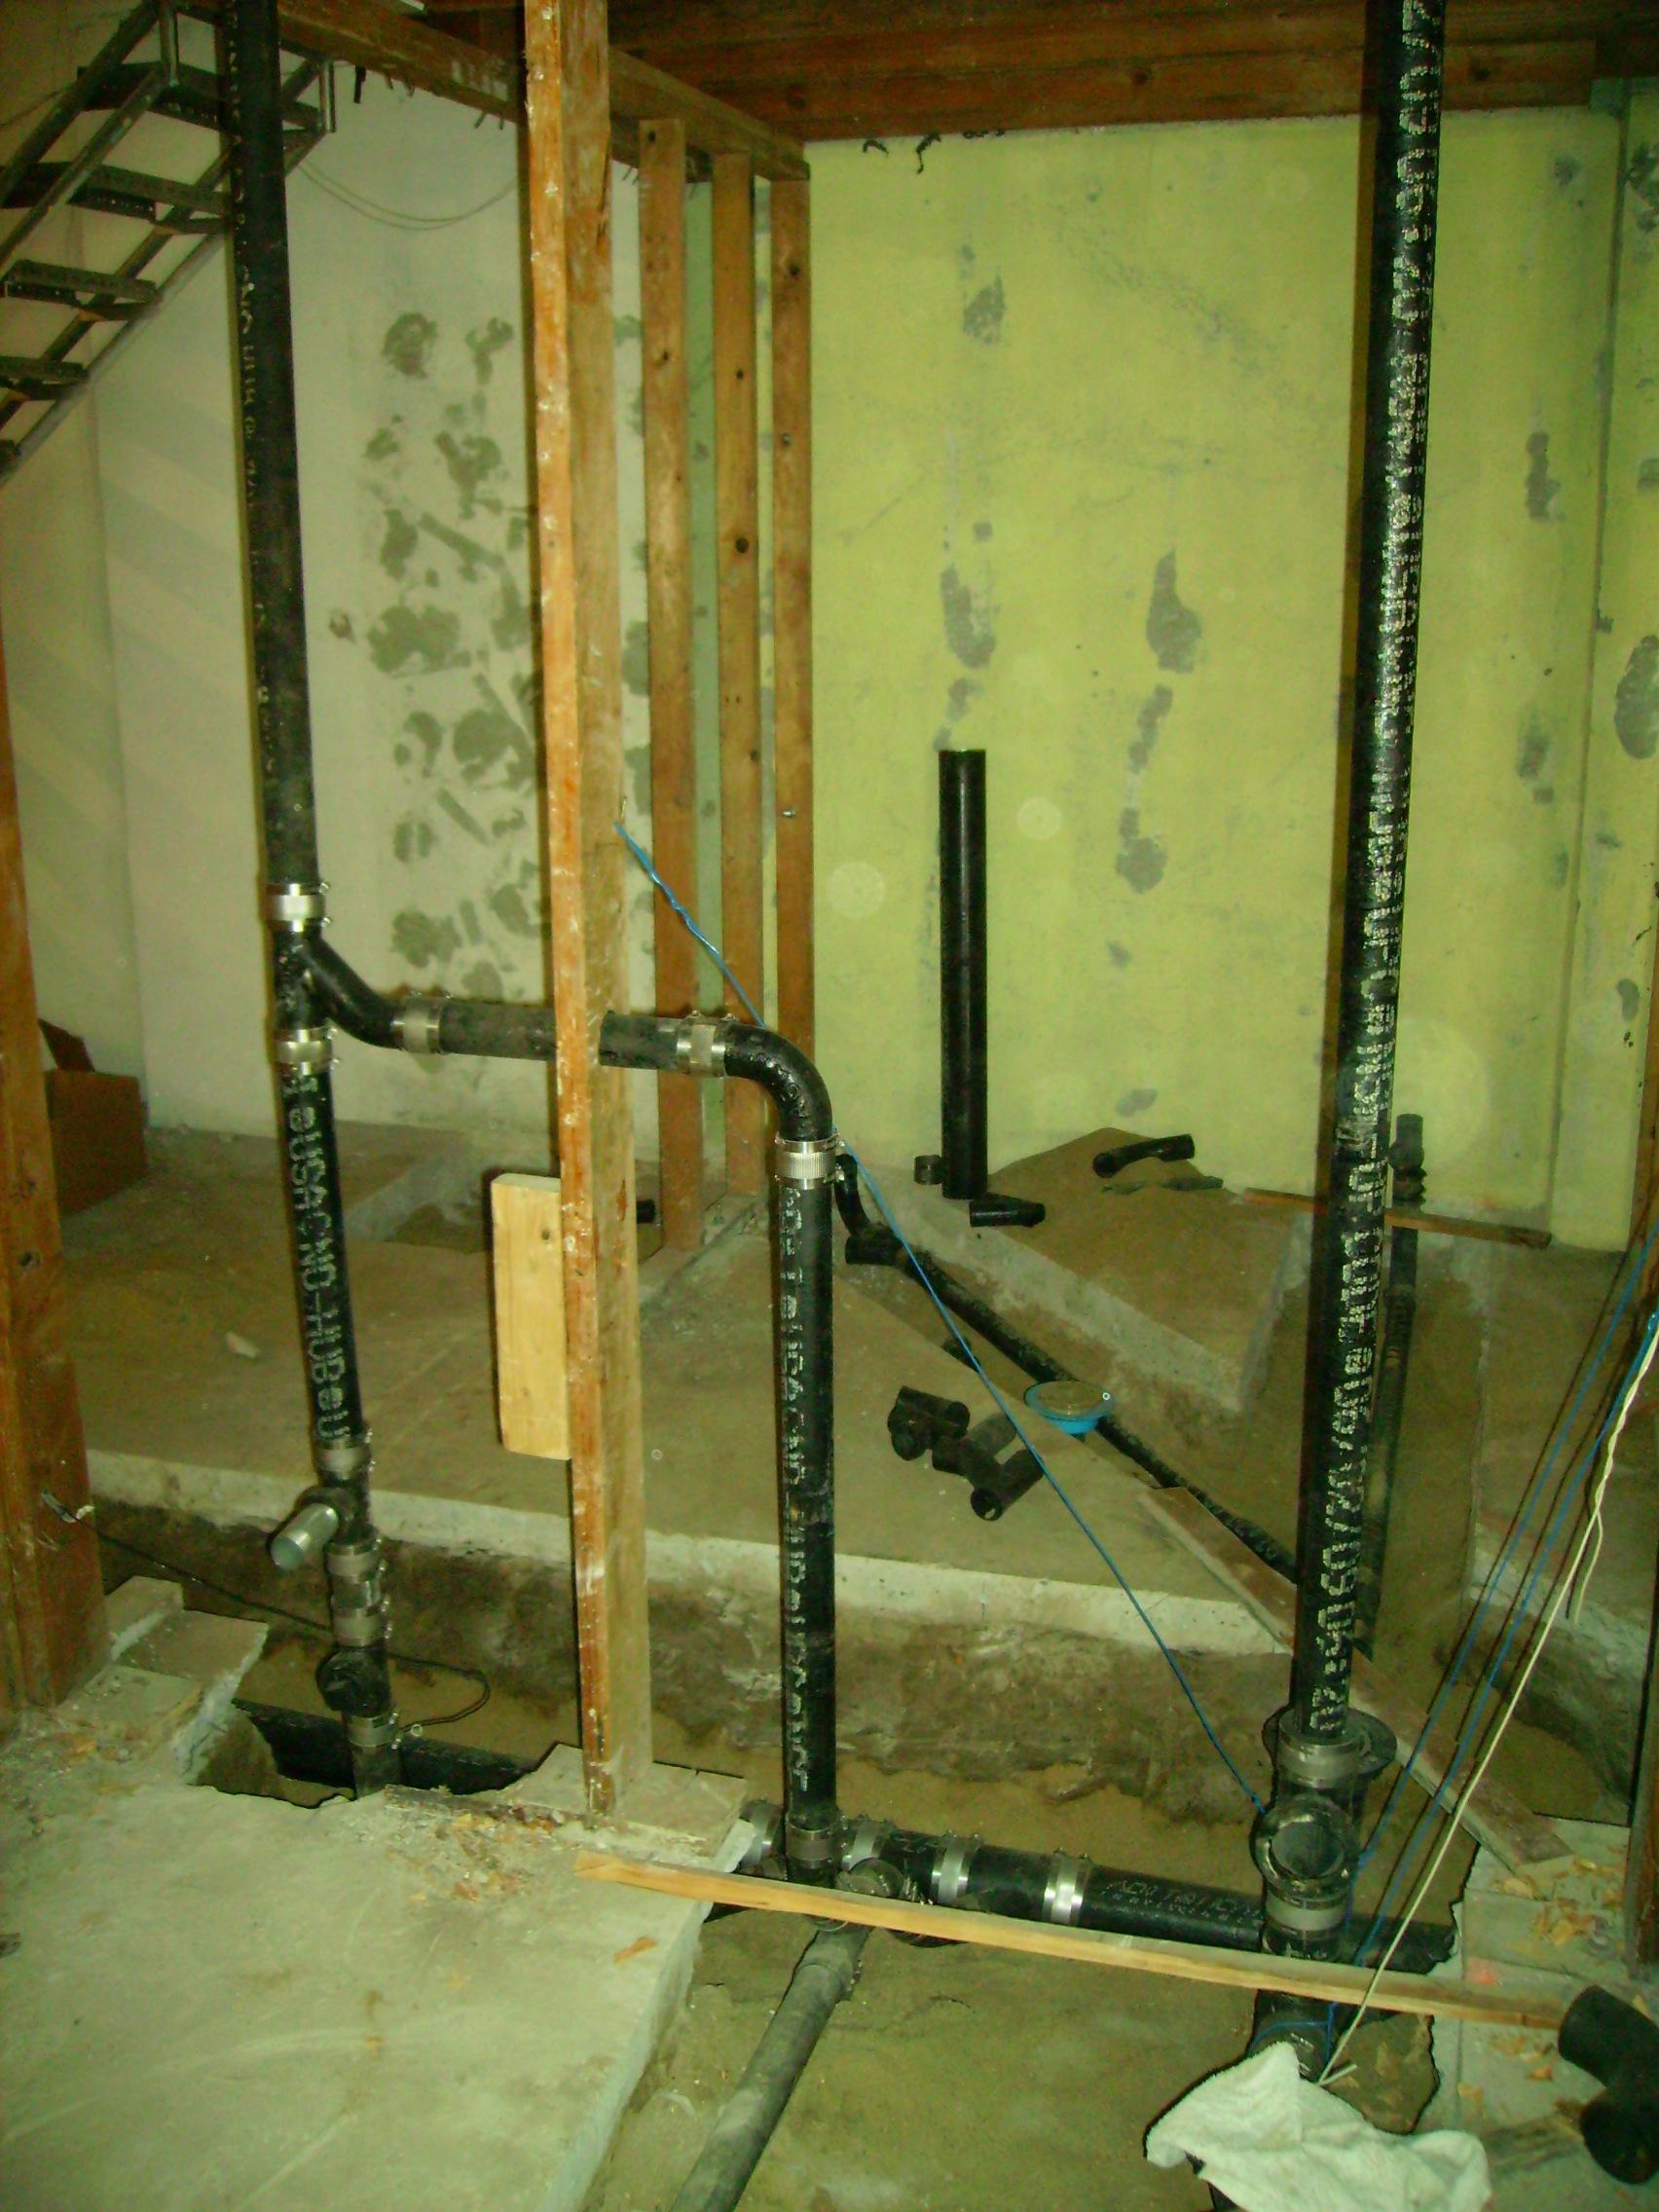 Plumbing rough 10 eagle rock brewery for Toilet rough plumbing